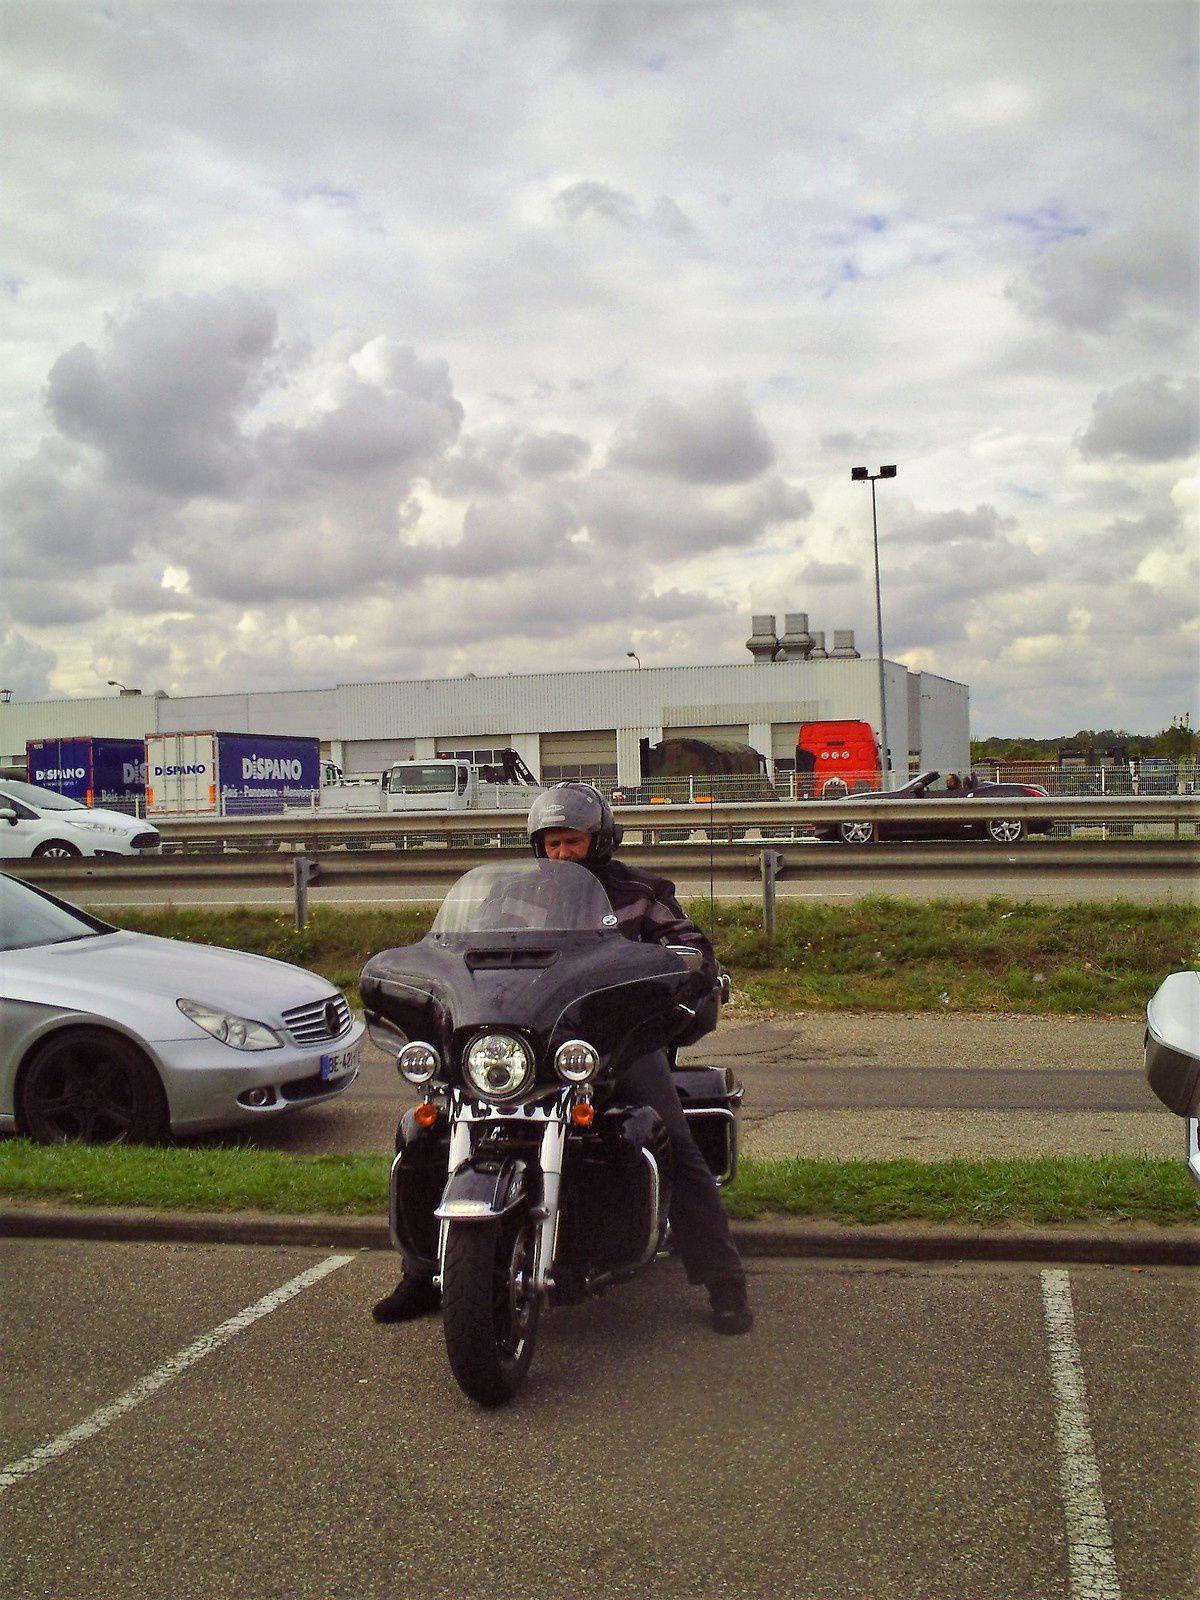 Goldwing - j'ai essayé la fameuse Harley Davidson ultra glide